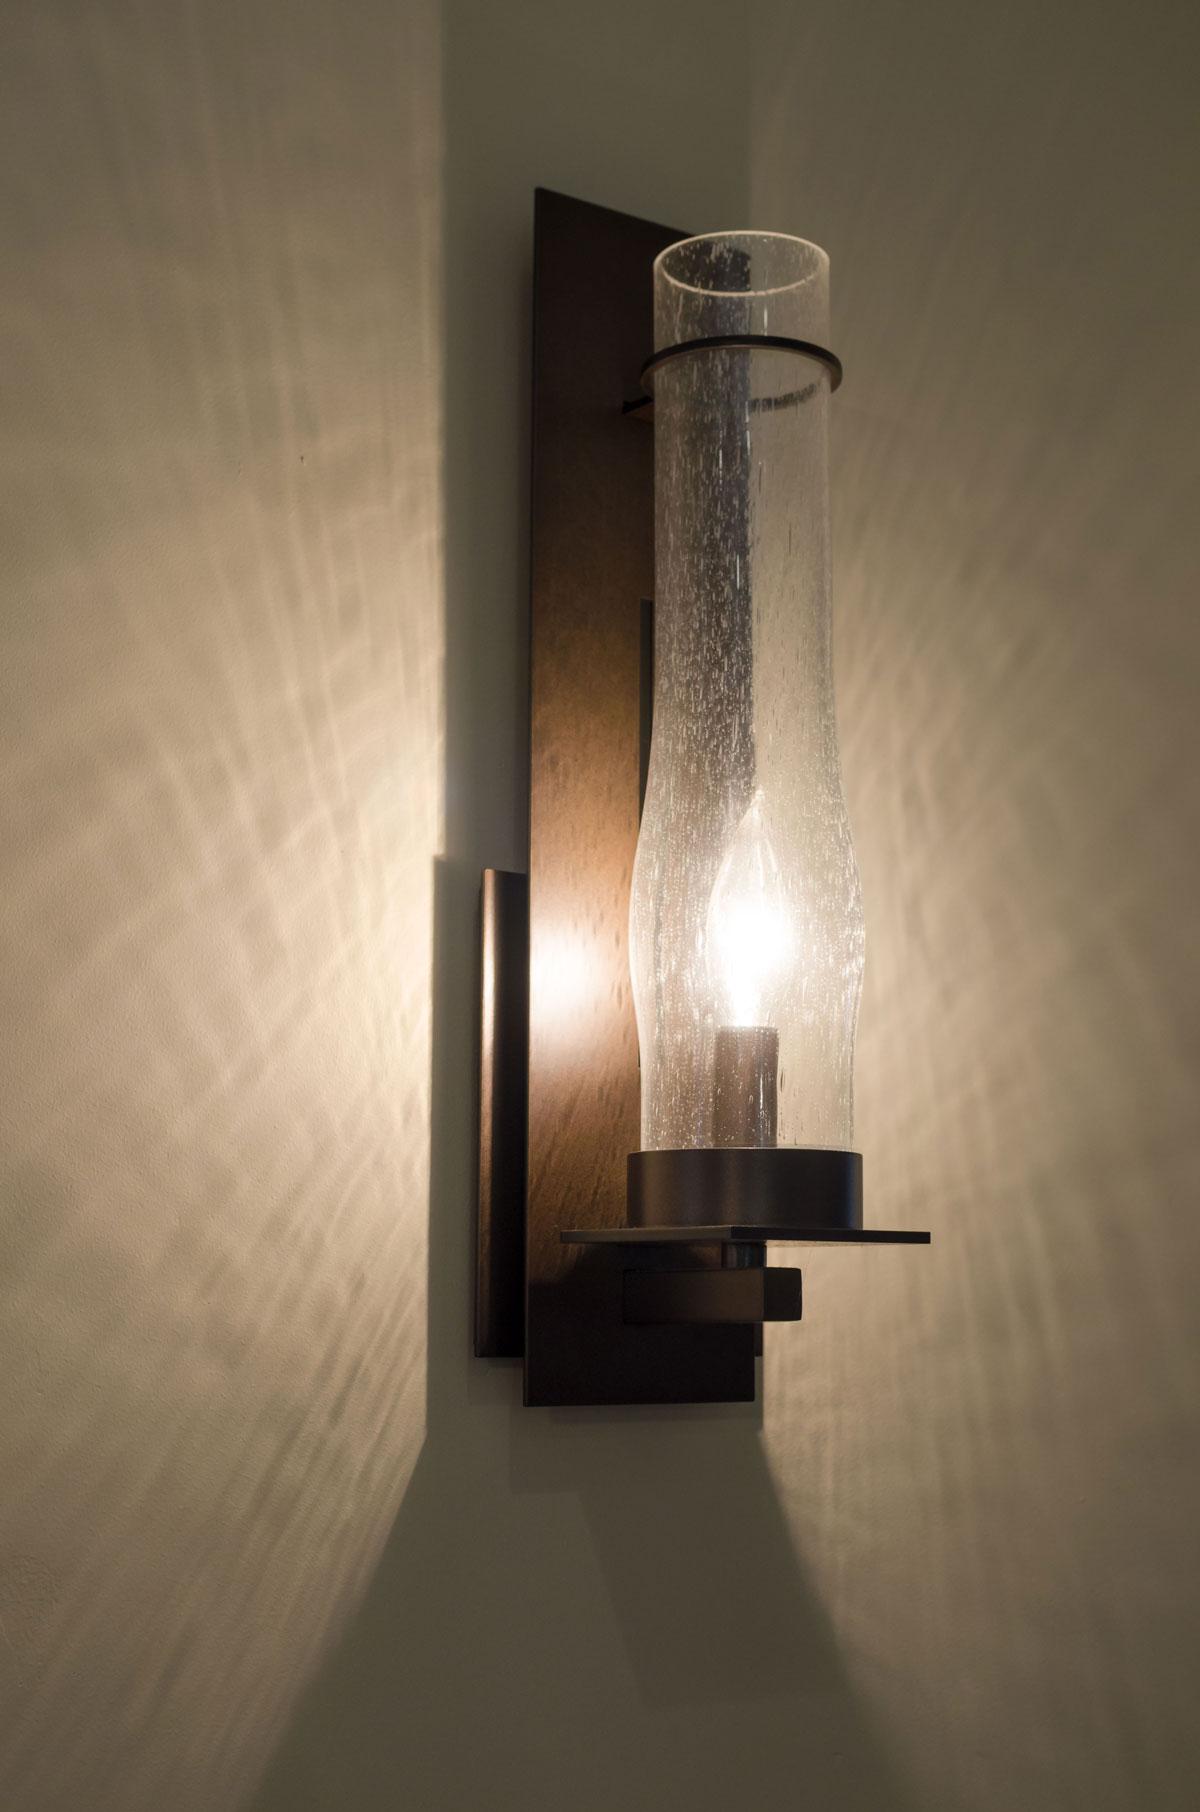 Duxbury, MA lighting design by Susan Curtis Interiors